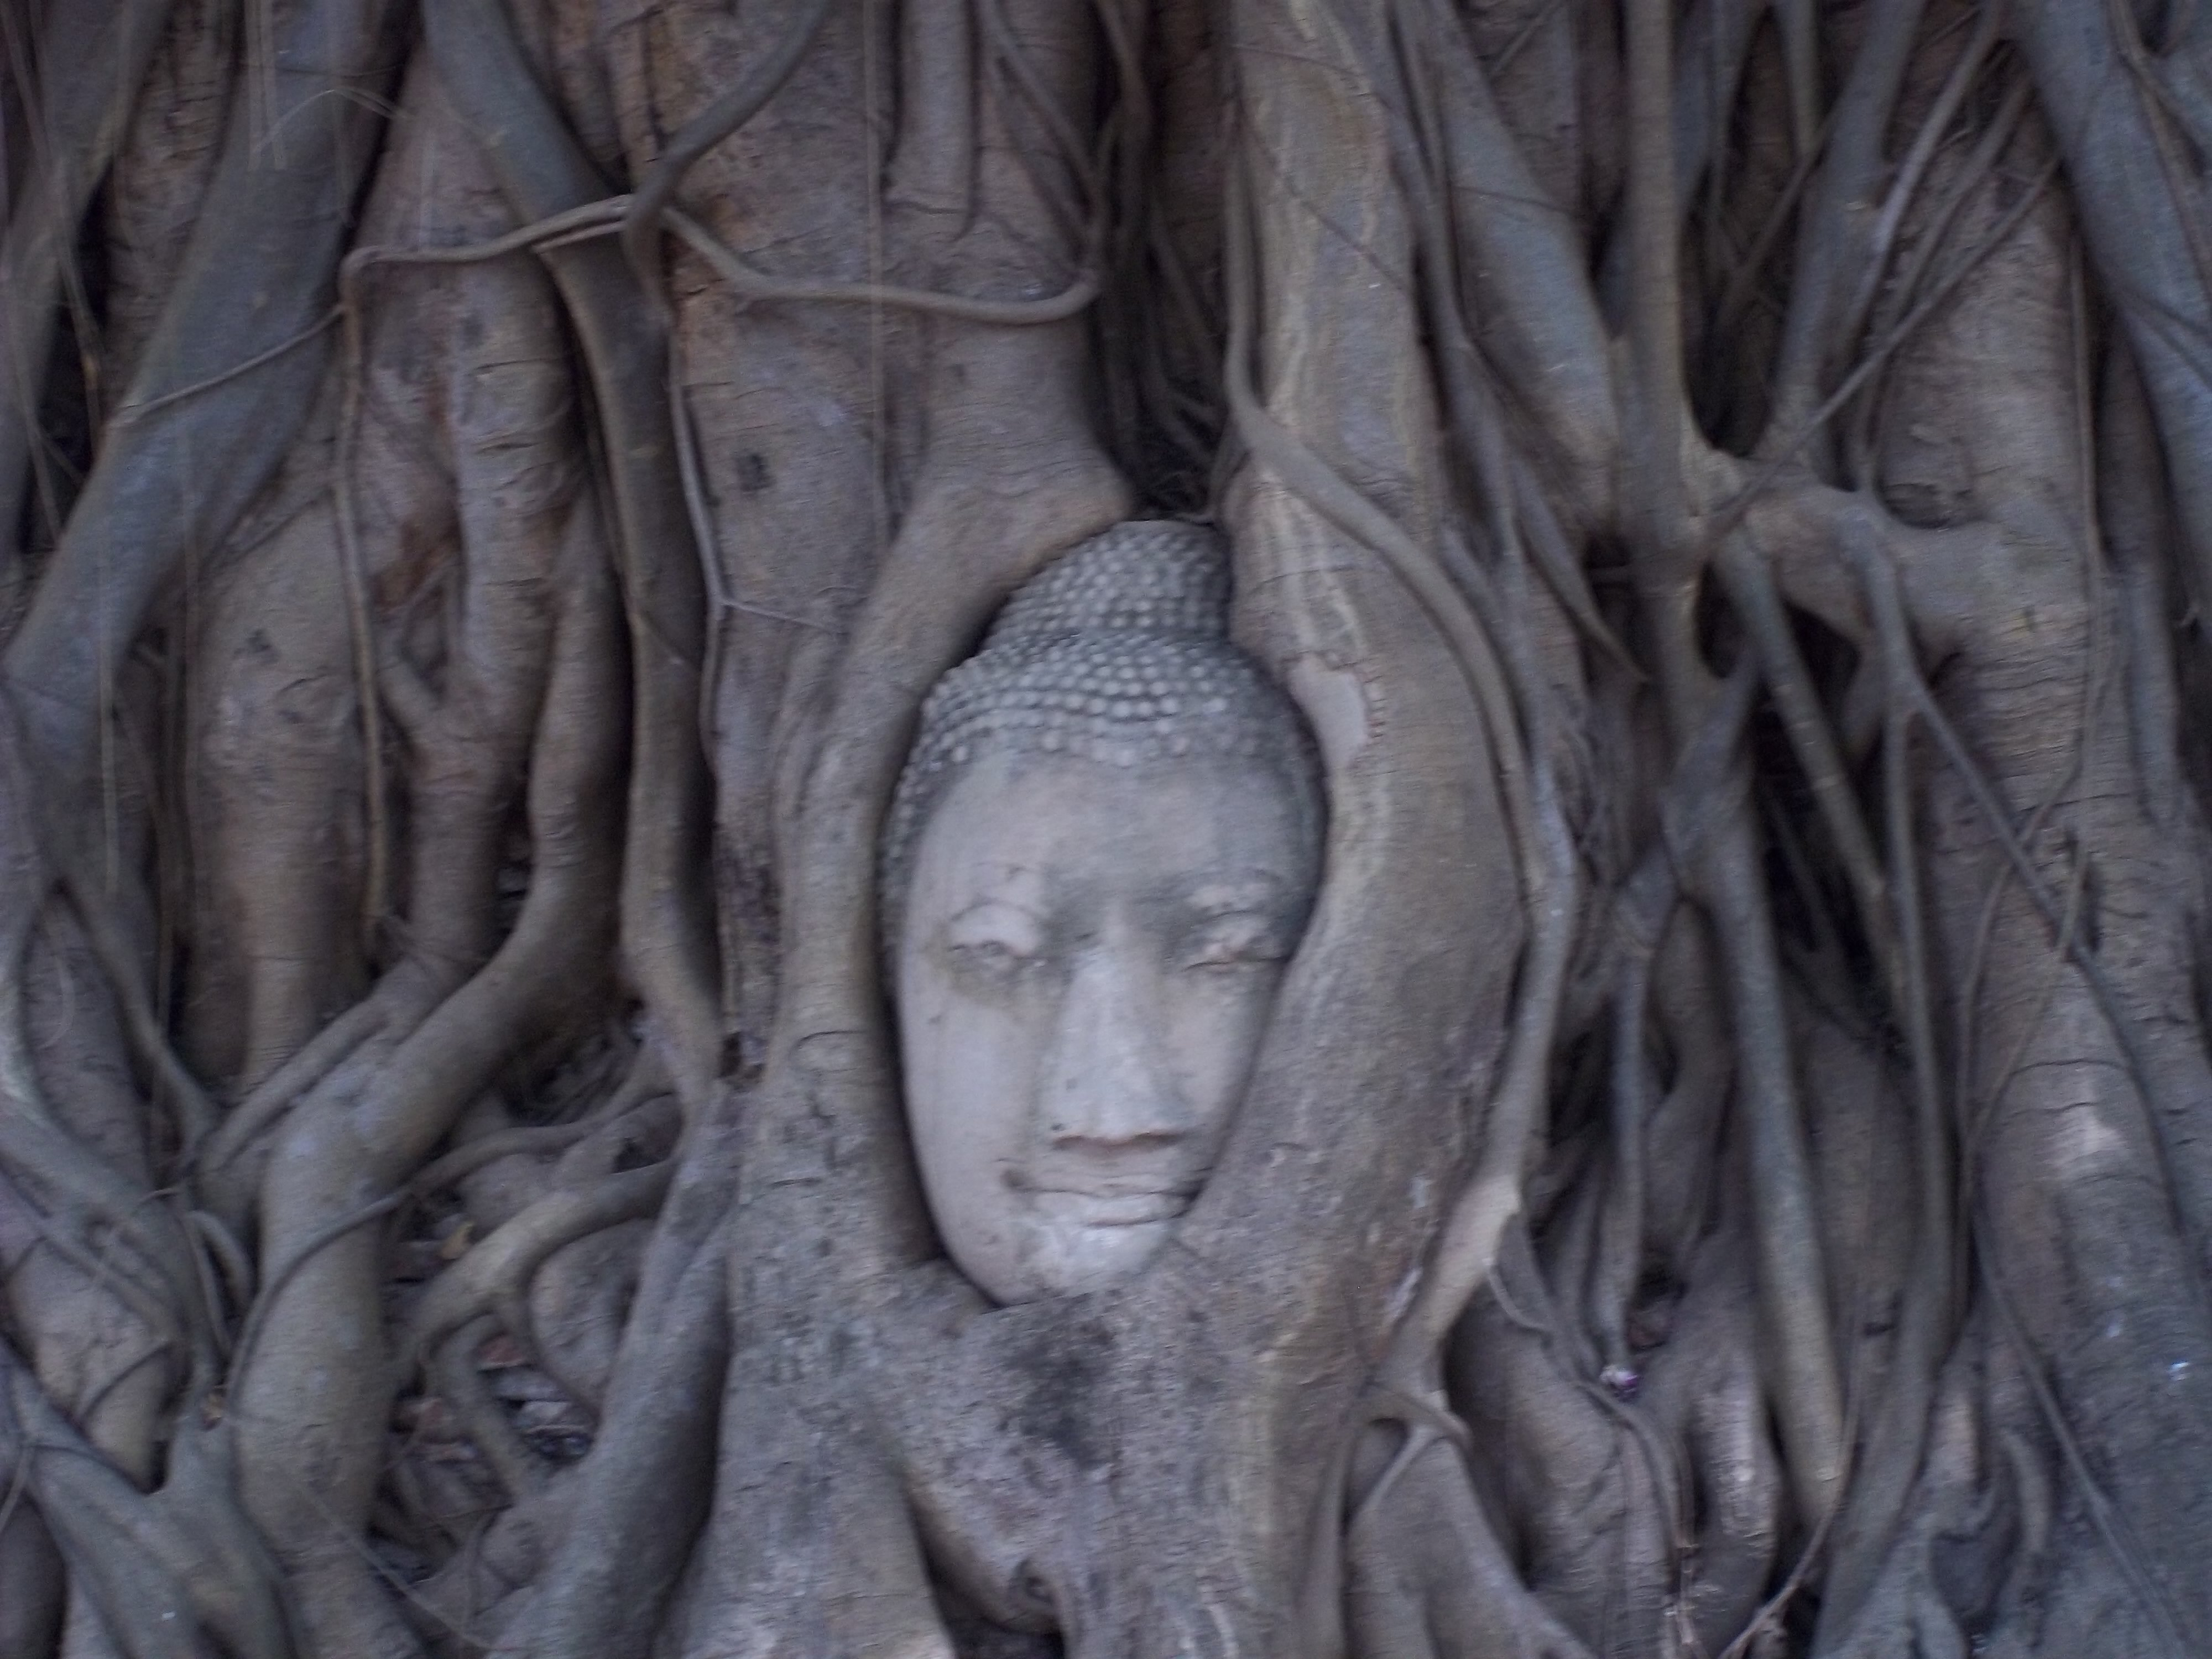 Buddha head in Bodhi tree in Ayutthaya